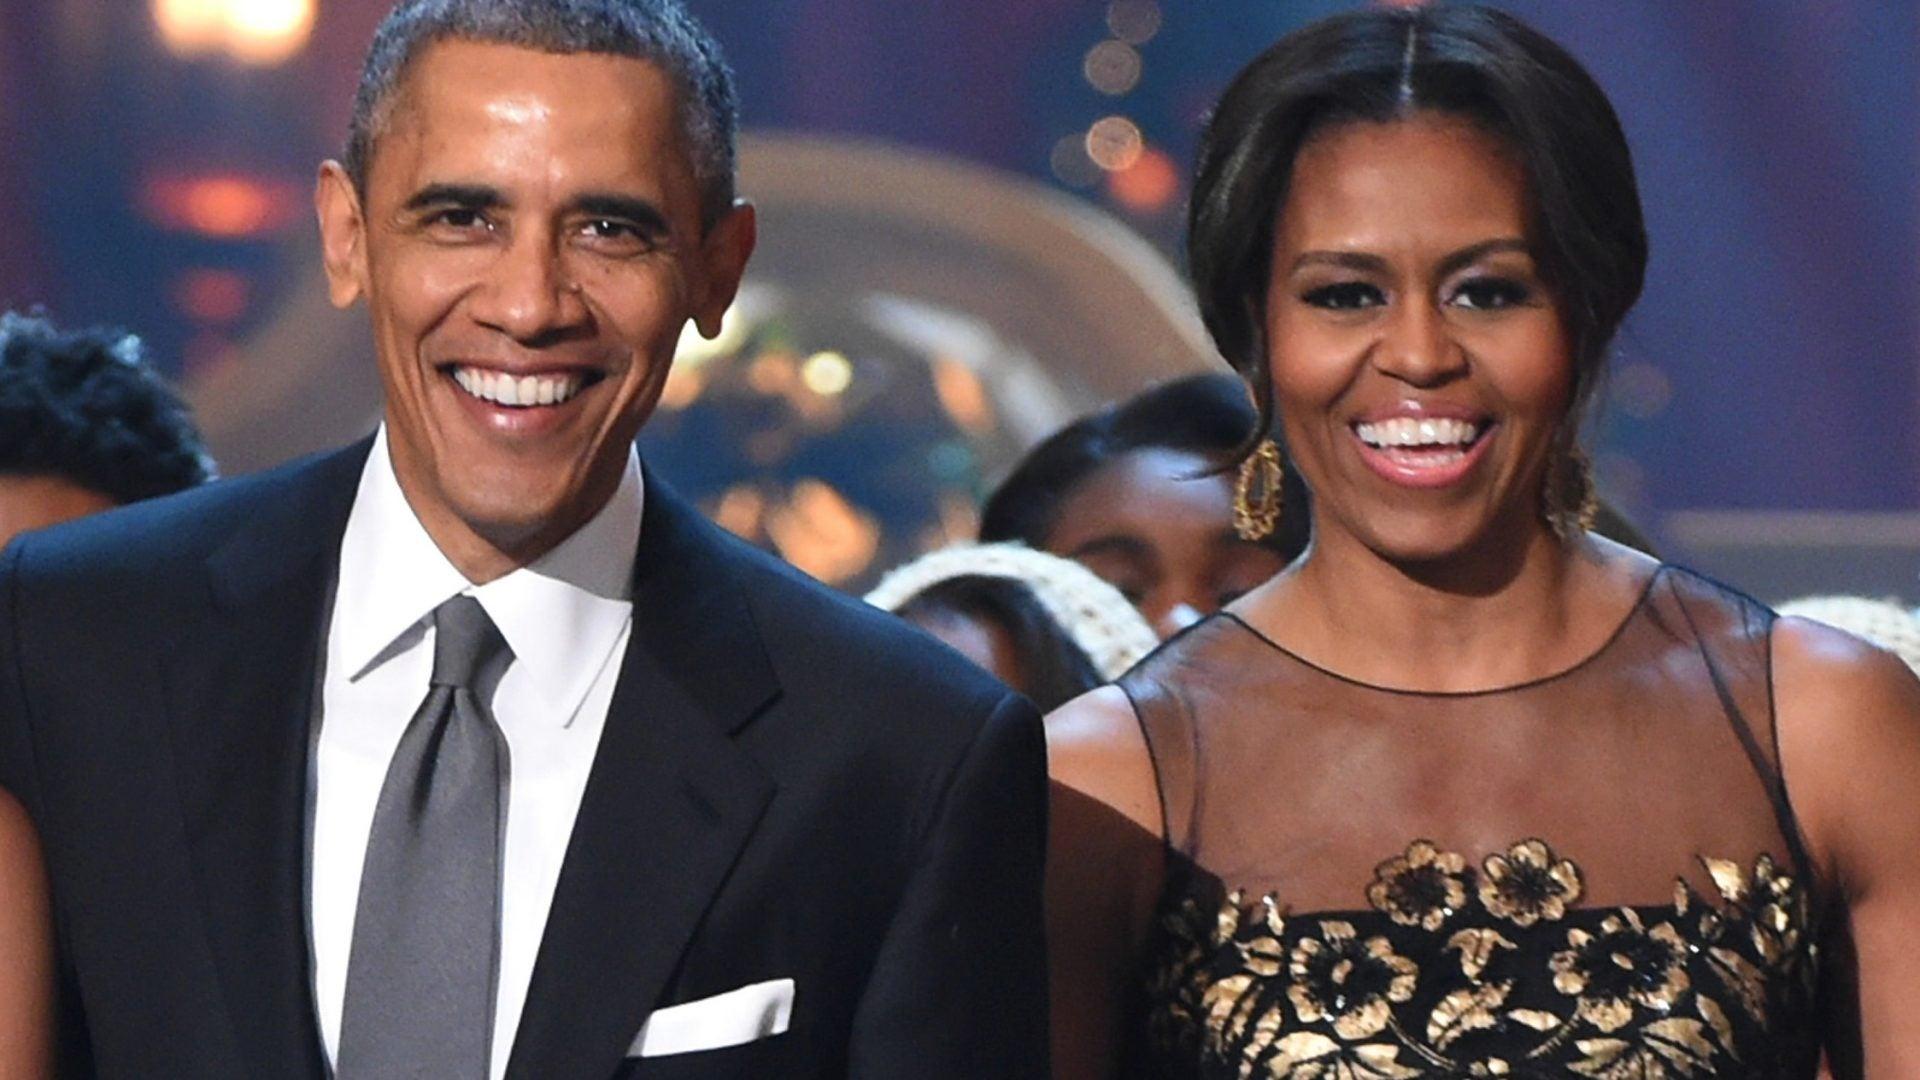 Michelle Obama Wishes Barack Obama A Happy 59th Birthday